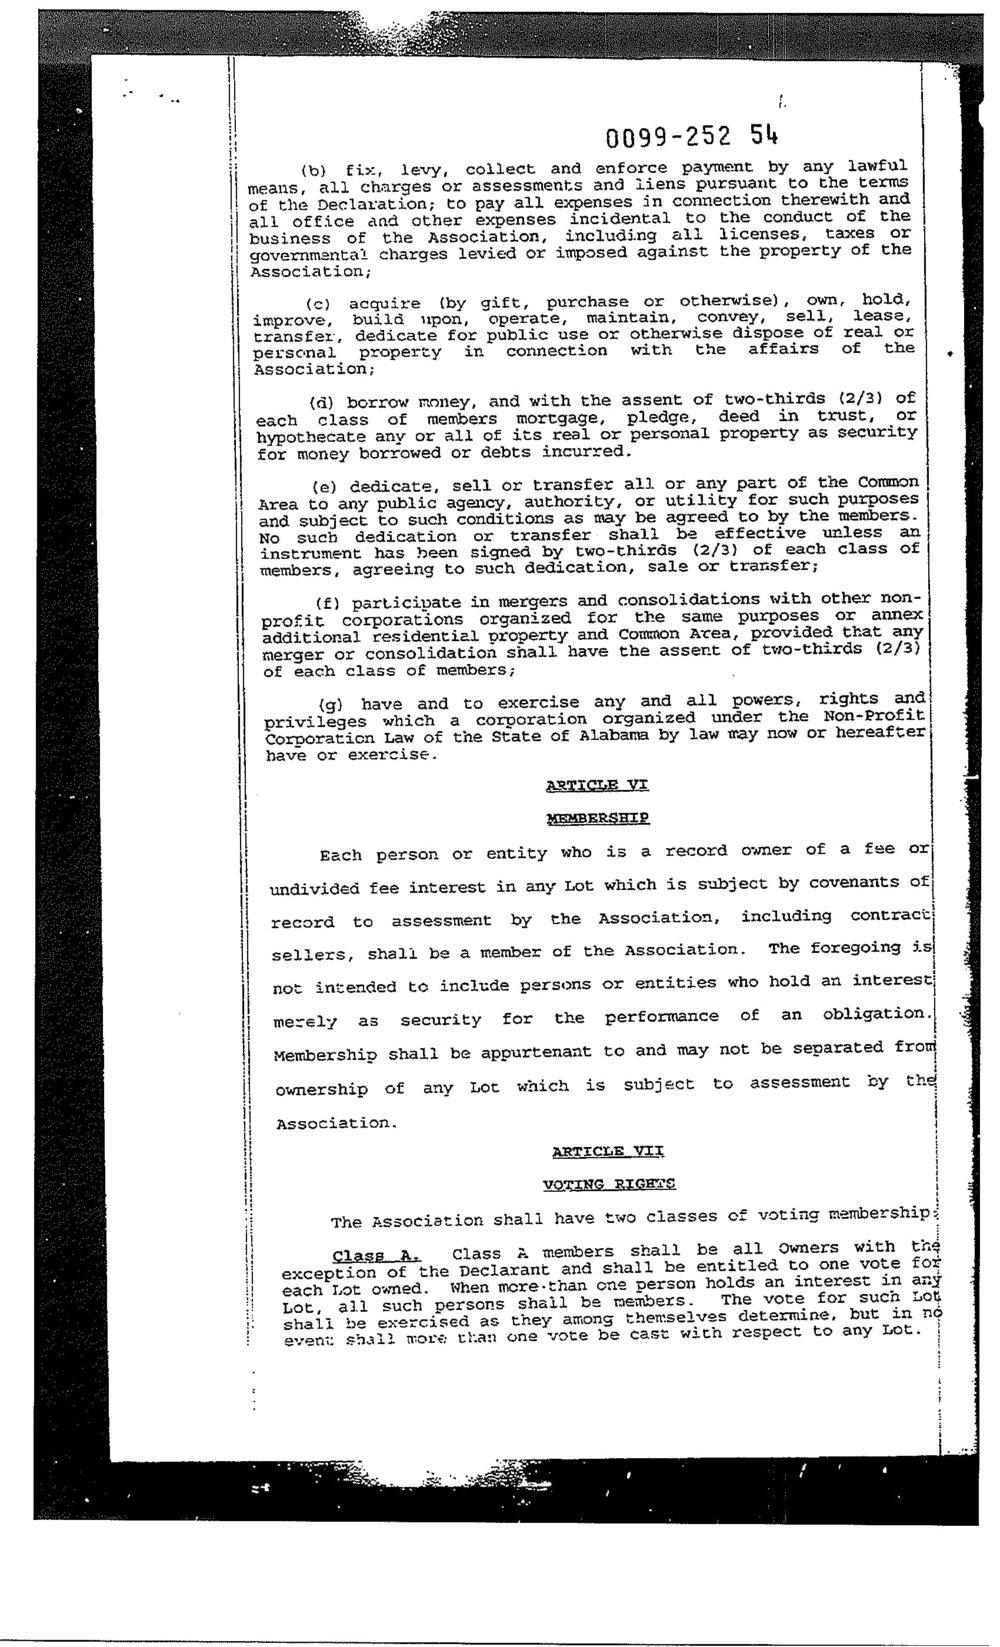 Covenants-Winborne-Park-Phase-II-17.jpg